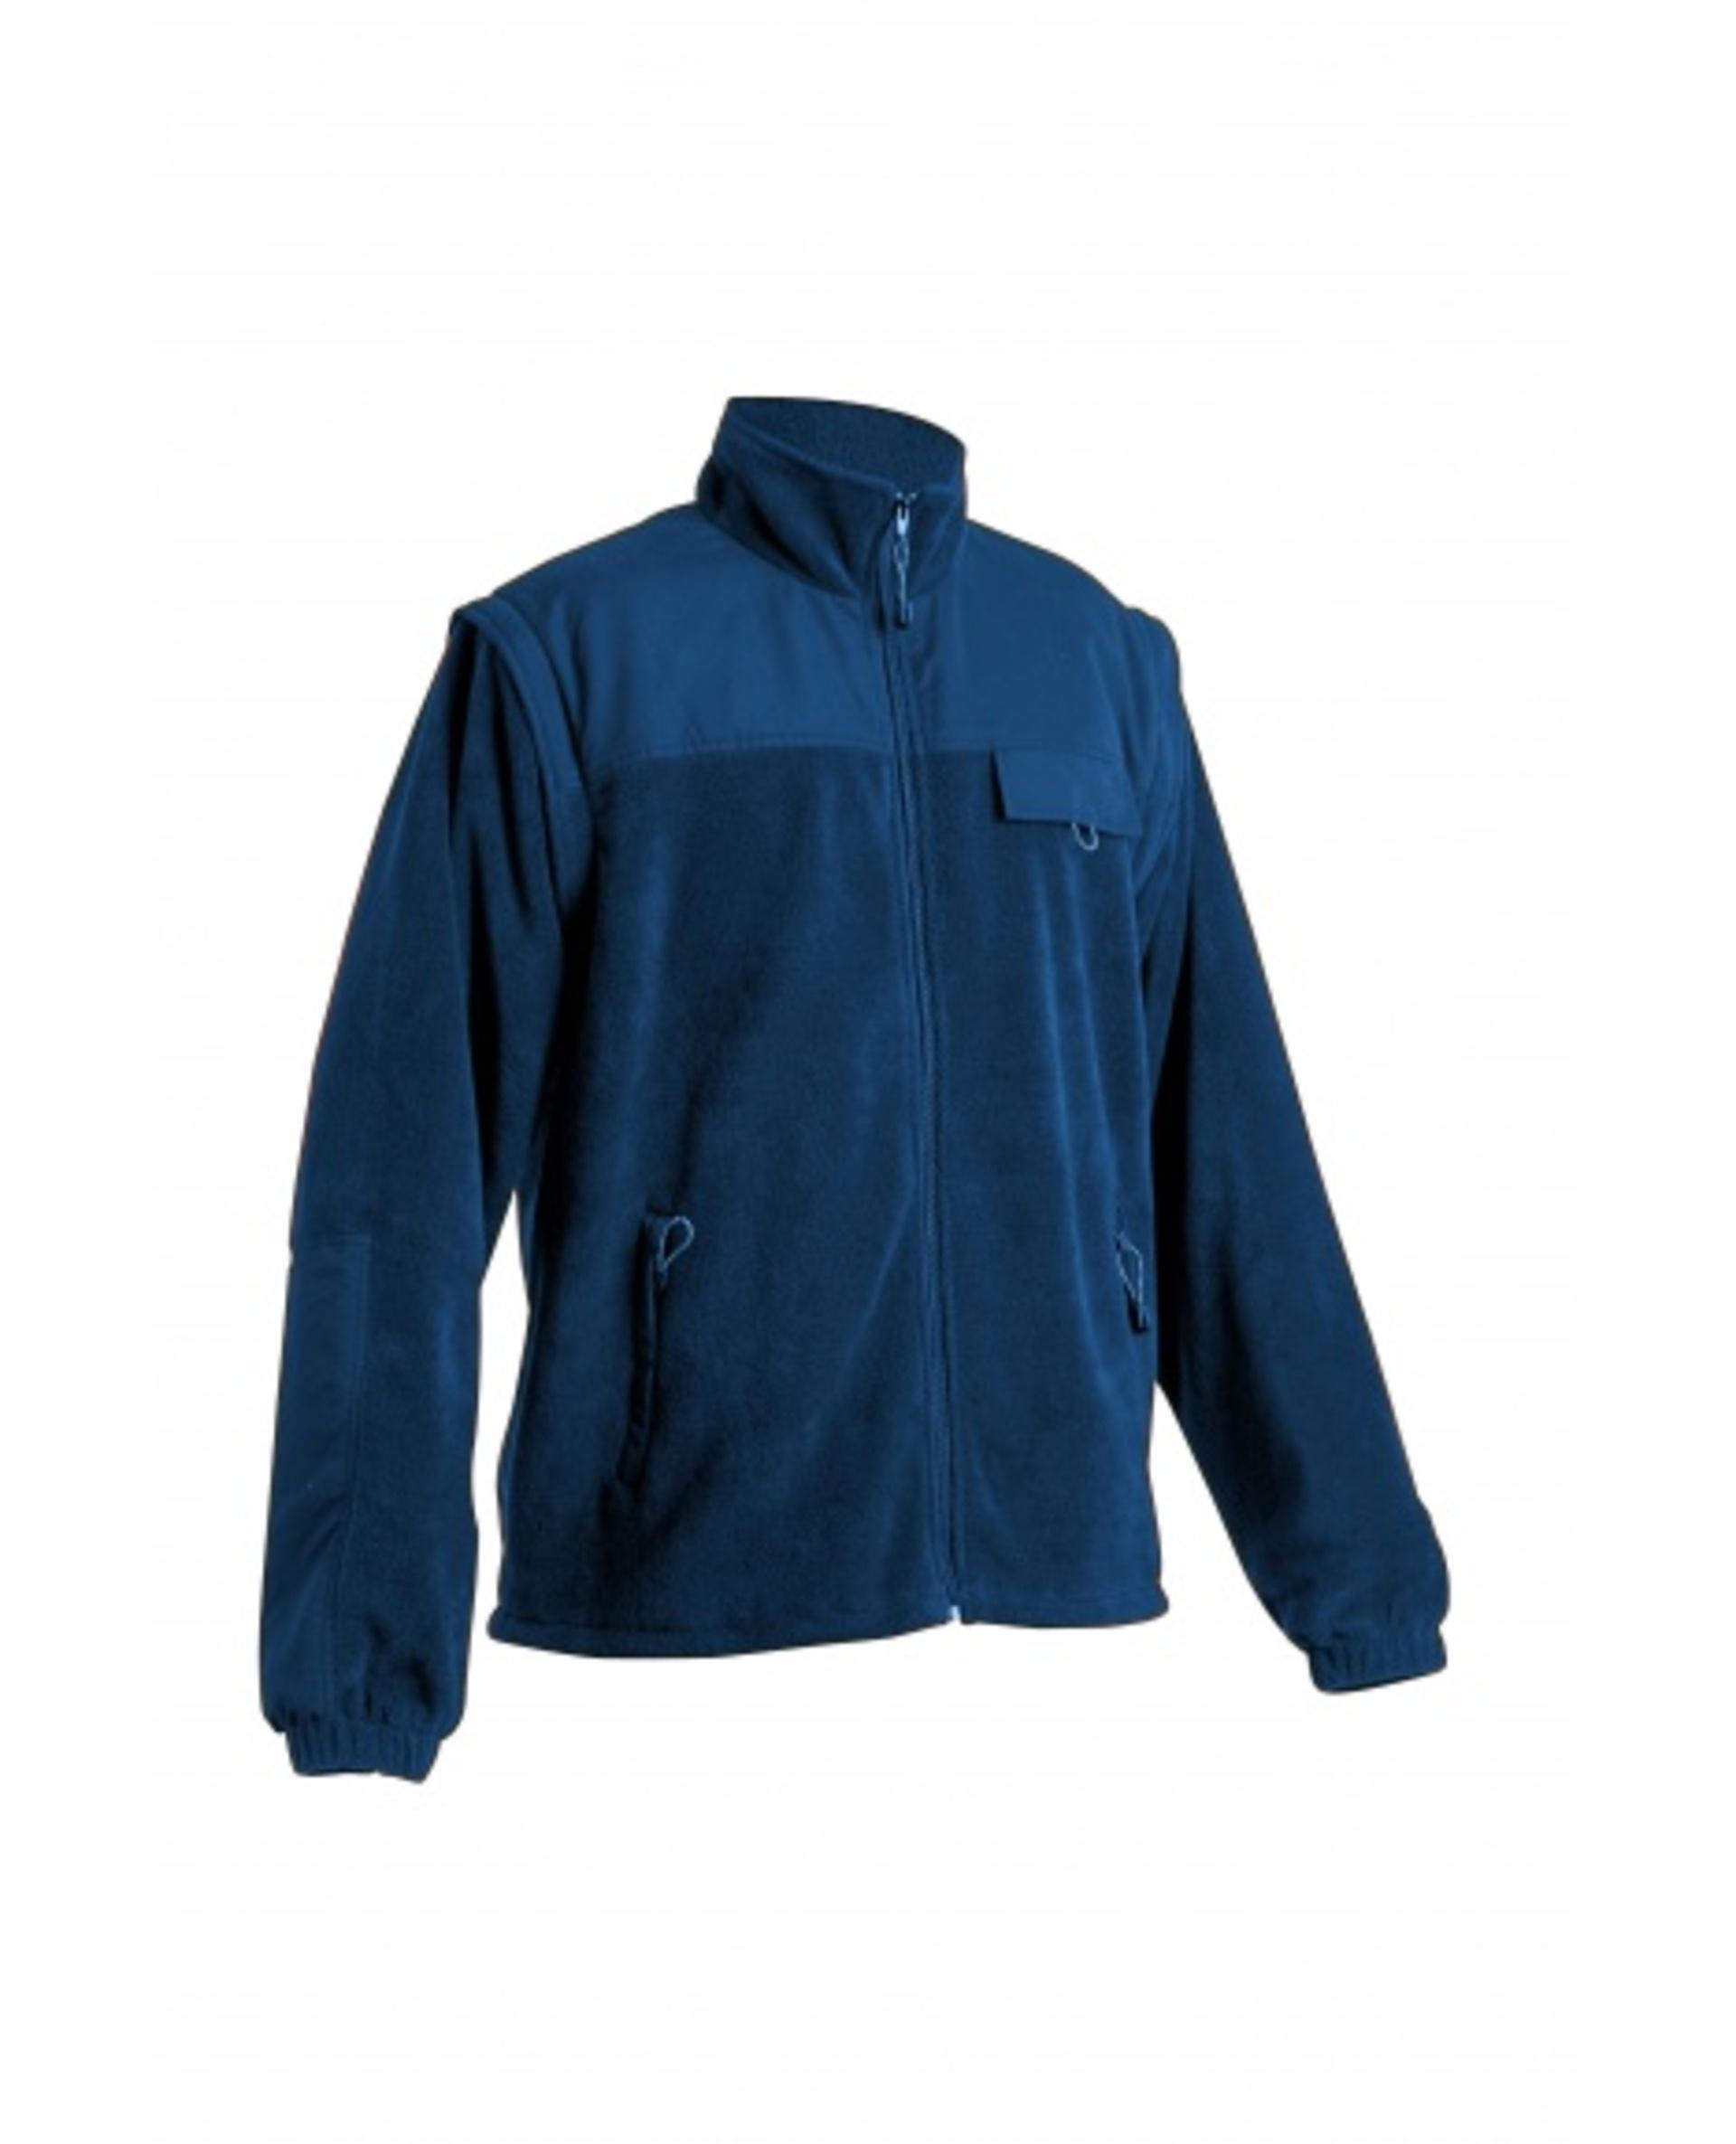 Cerva RANDWIK fleecová 2v1 Bunda tmavě modrá XL